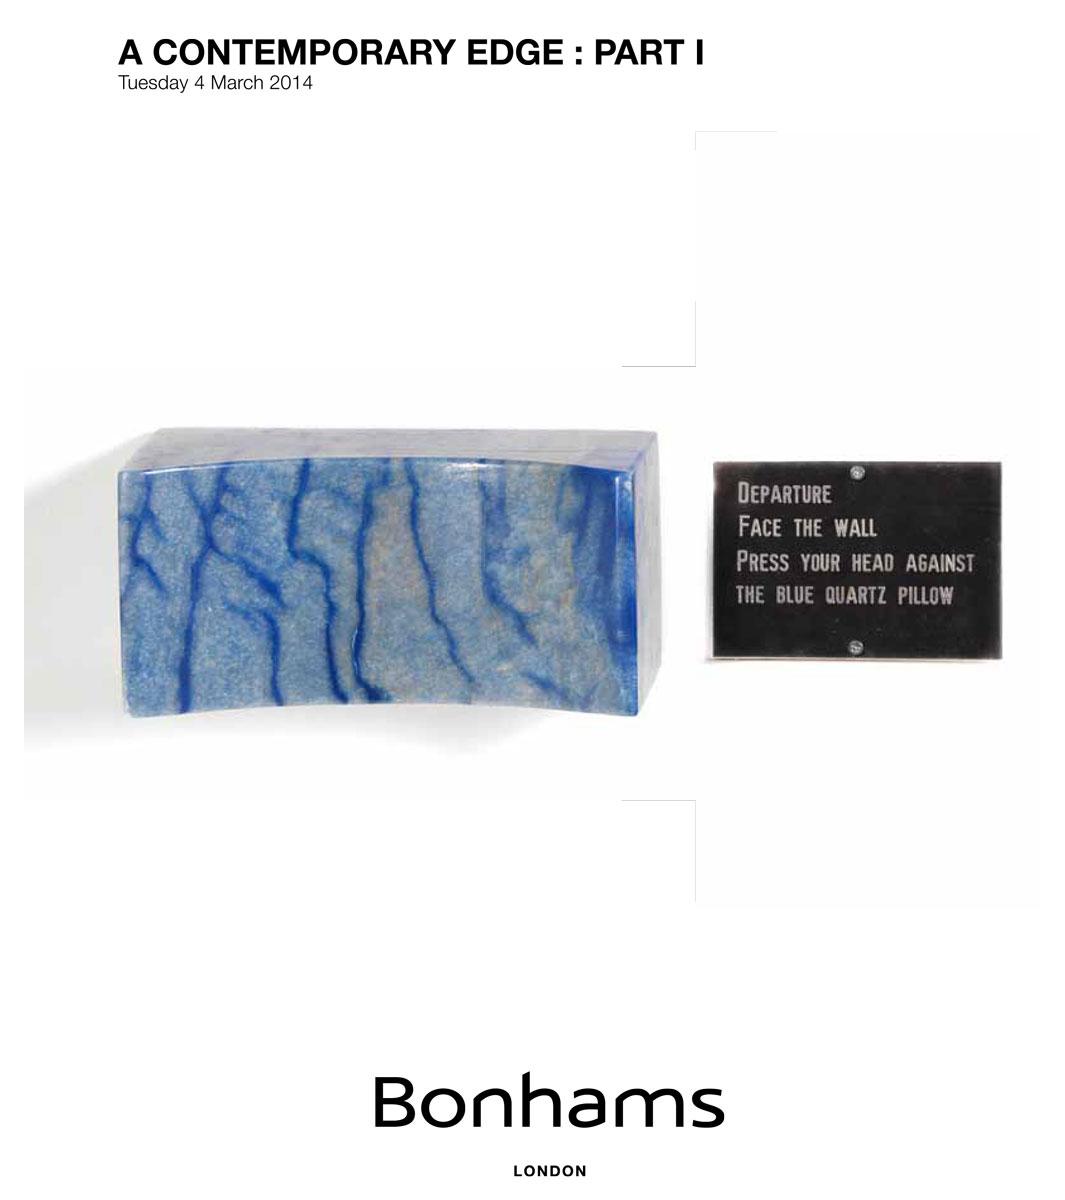 BONHAMS 03-2014